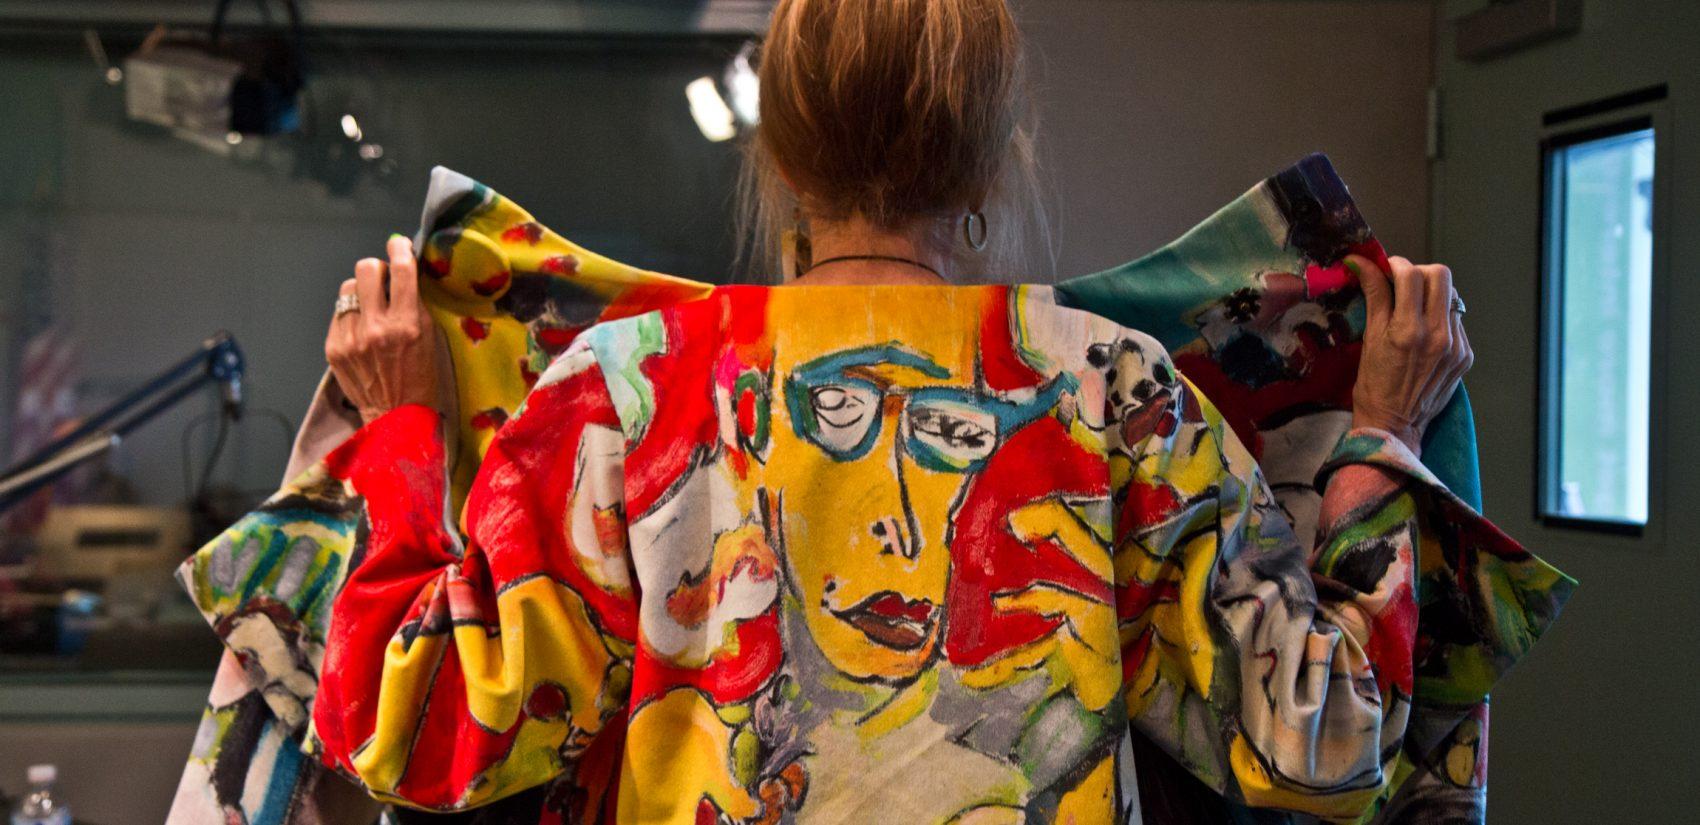 Designer Nancy Volpe Beringer at WHYY studios Tuesday. (Kimberly Paynter/WHYY)